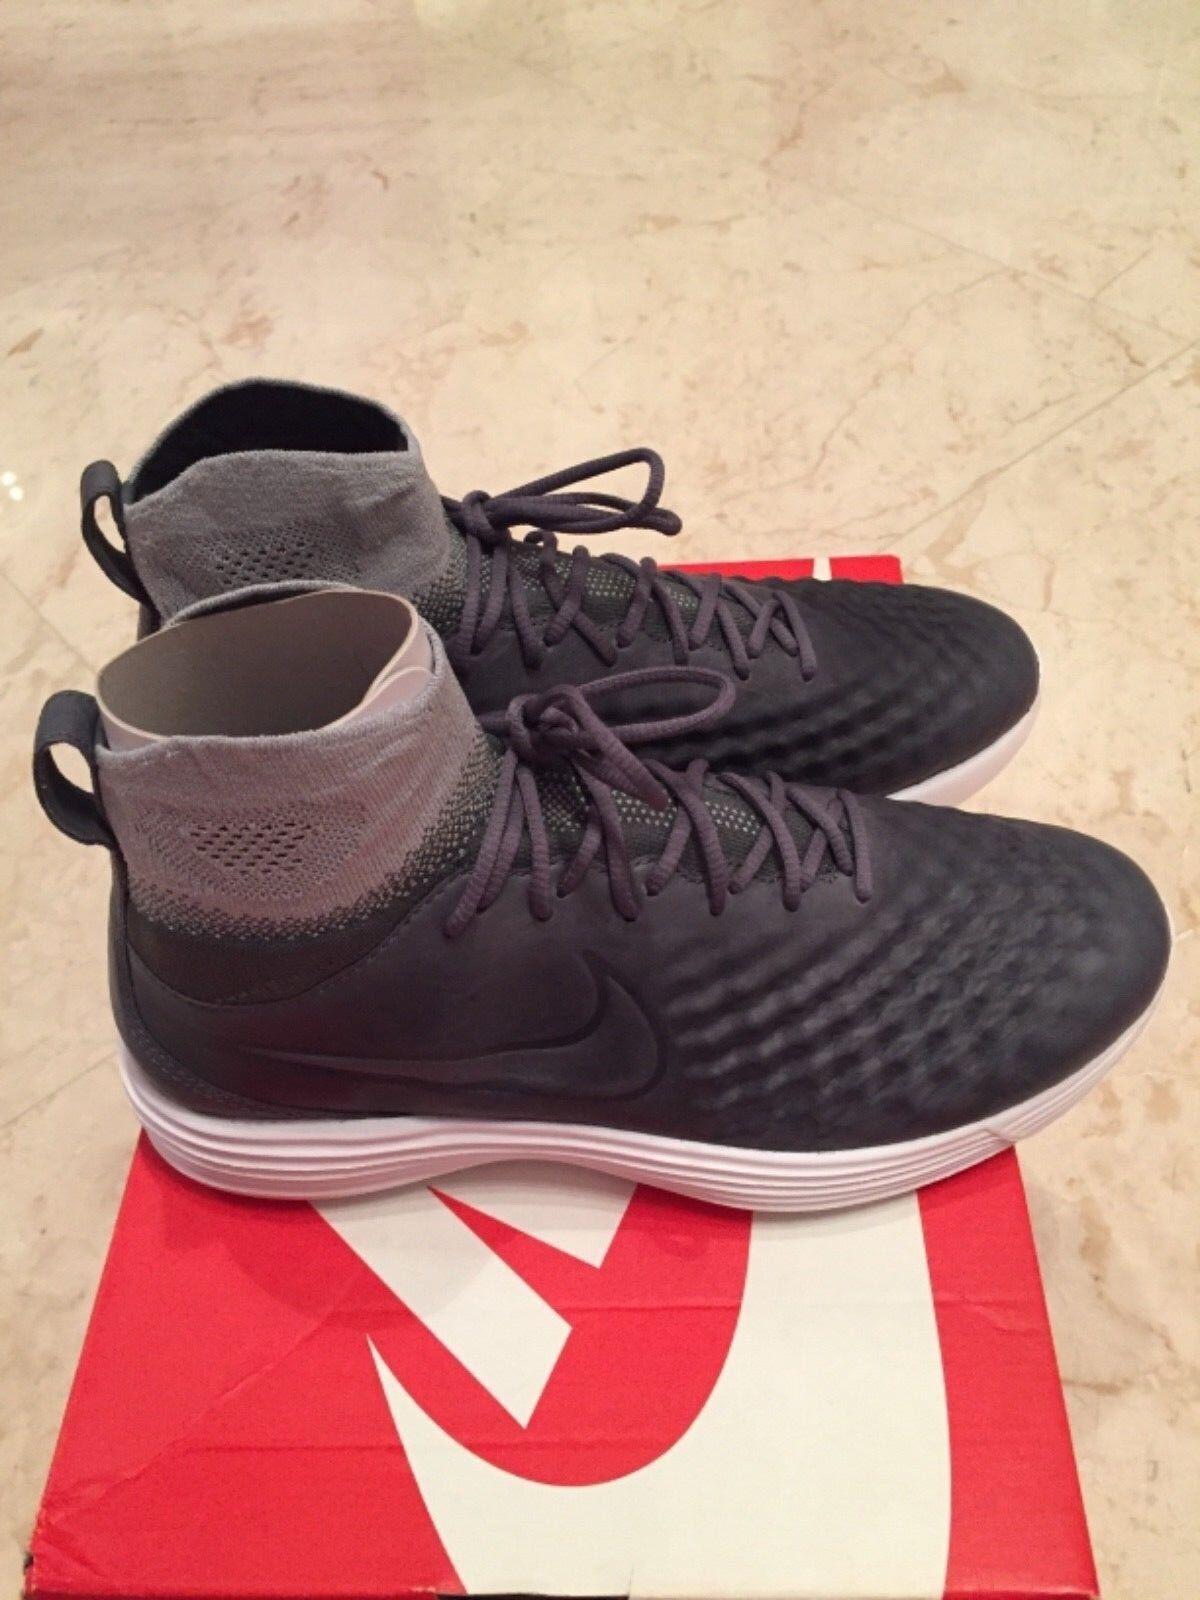 Nike lunar magista nuovo ii fk, sz 8, nuovo magista di zecca 7785d3